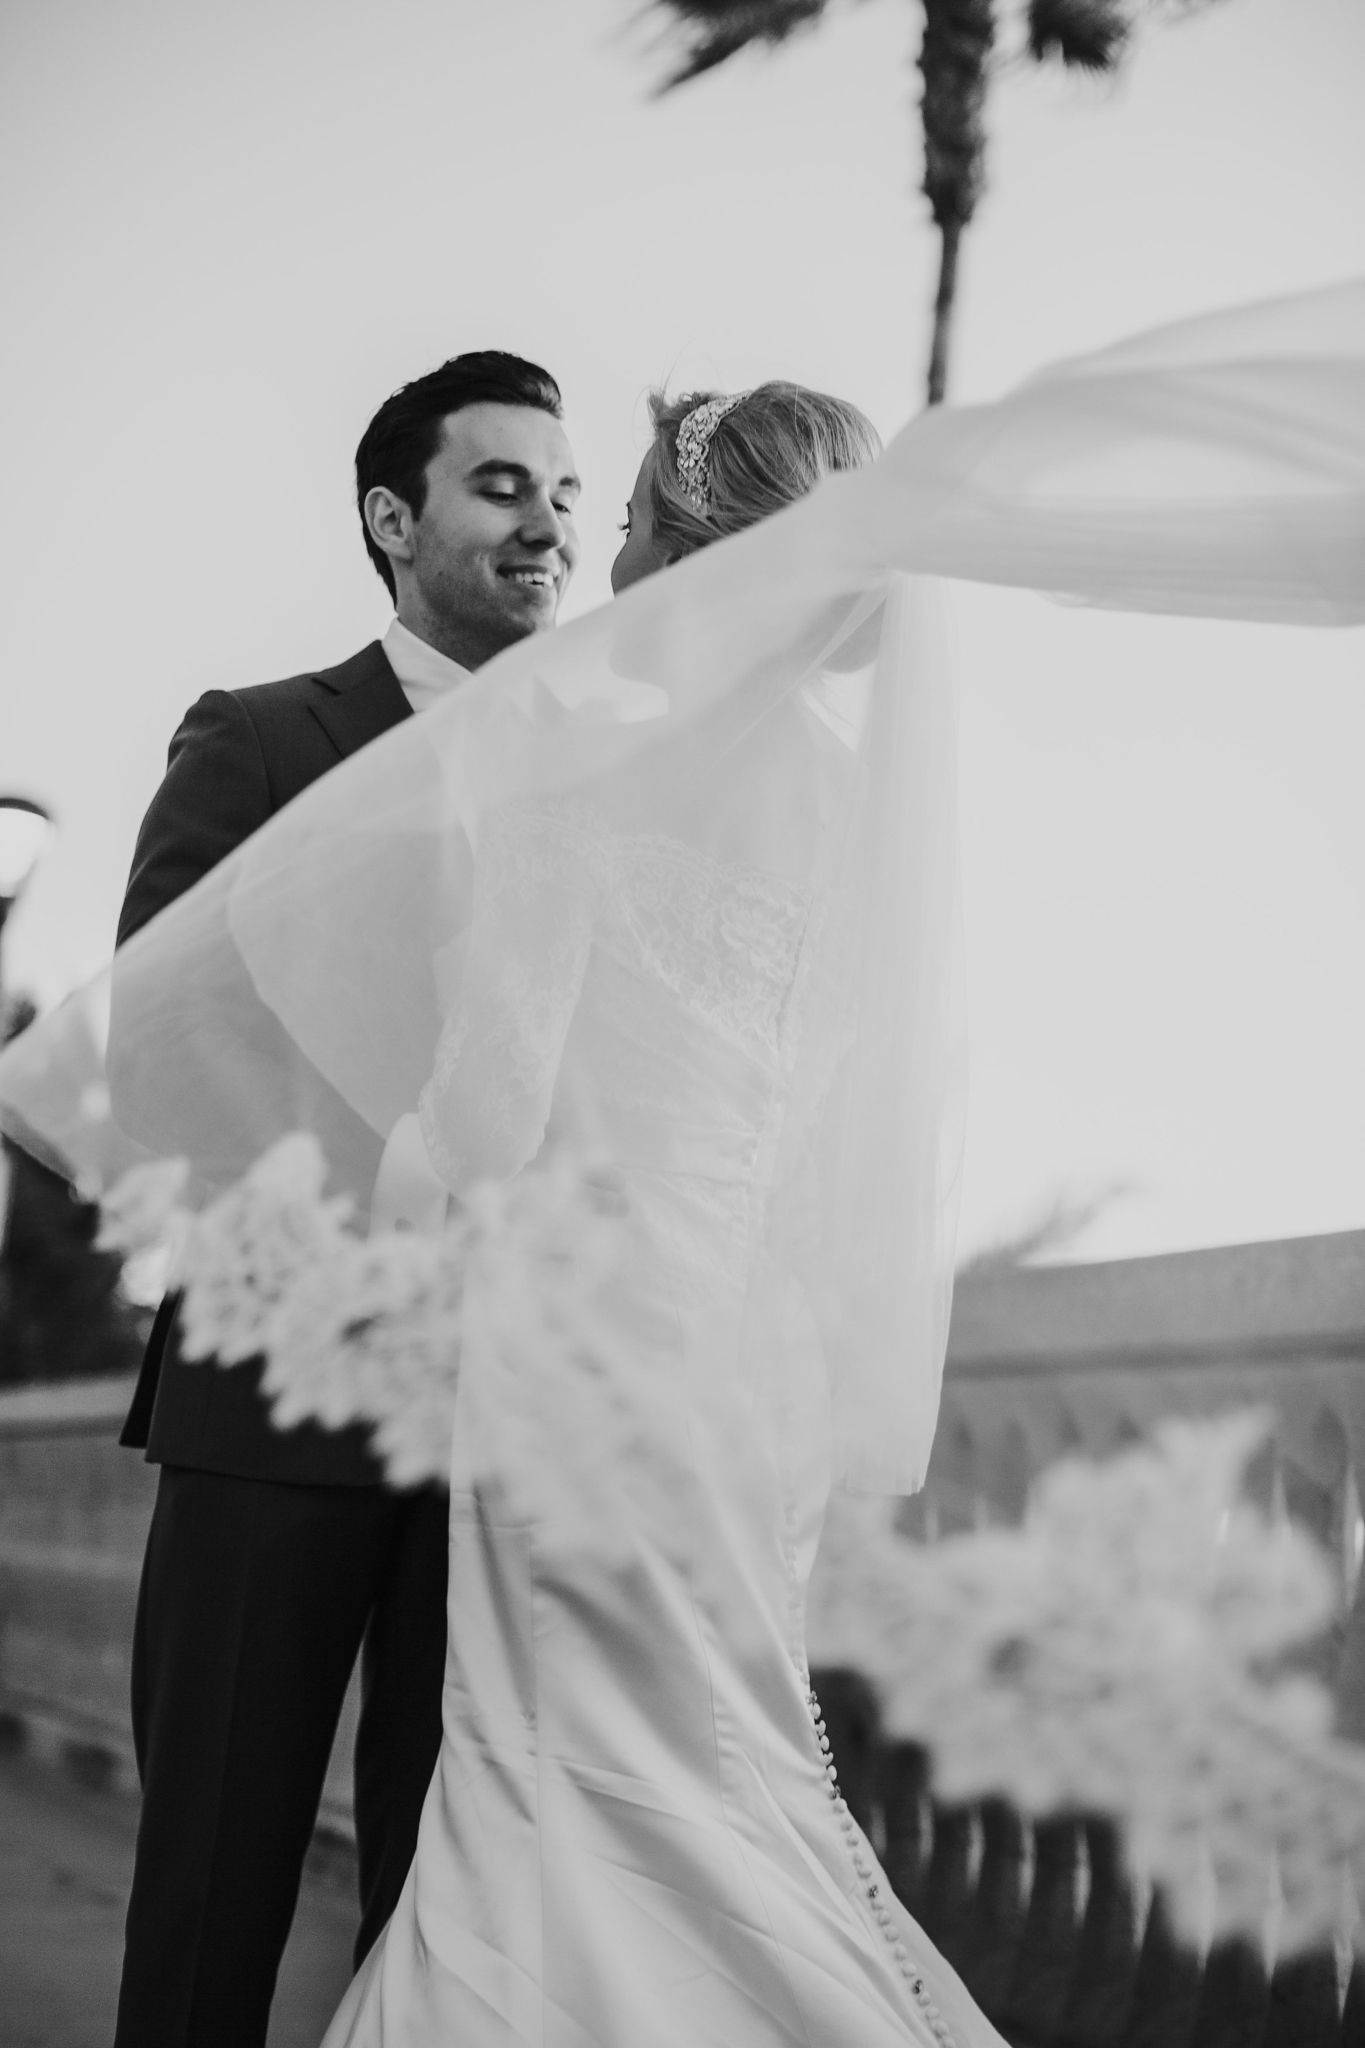 20151230_hussem_wedding_0694_web.jpg